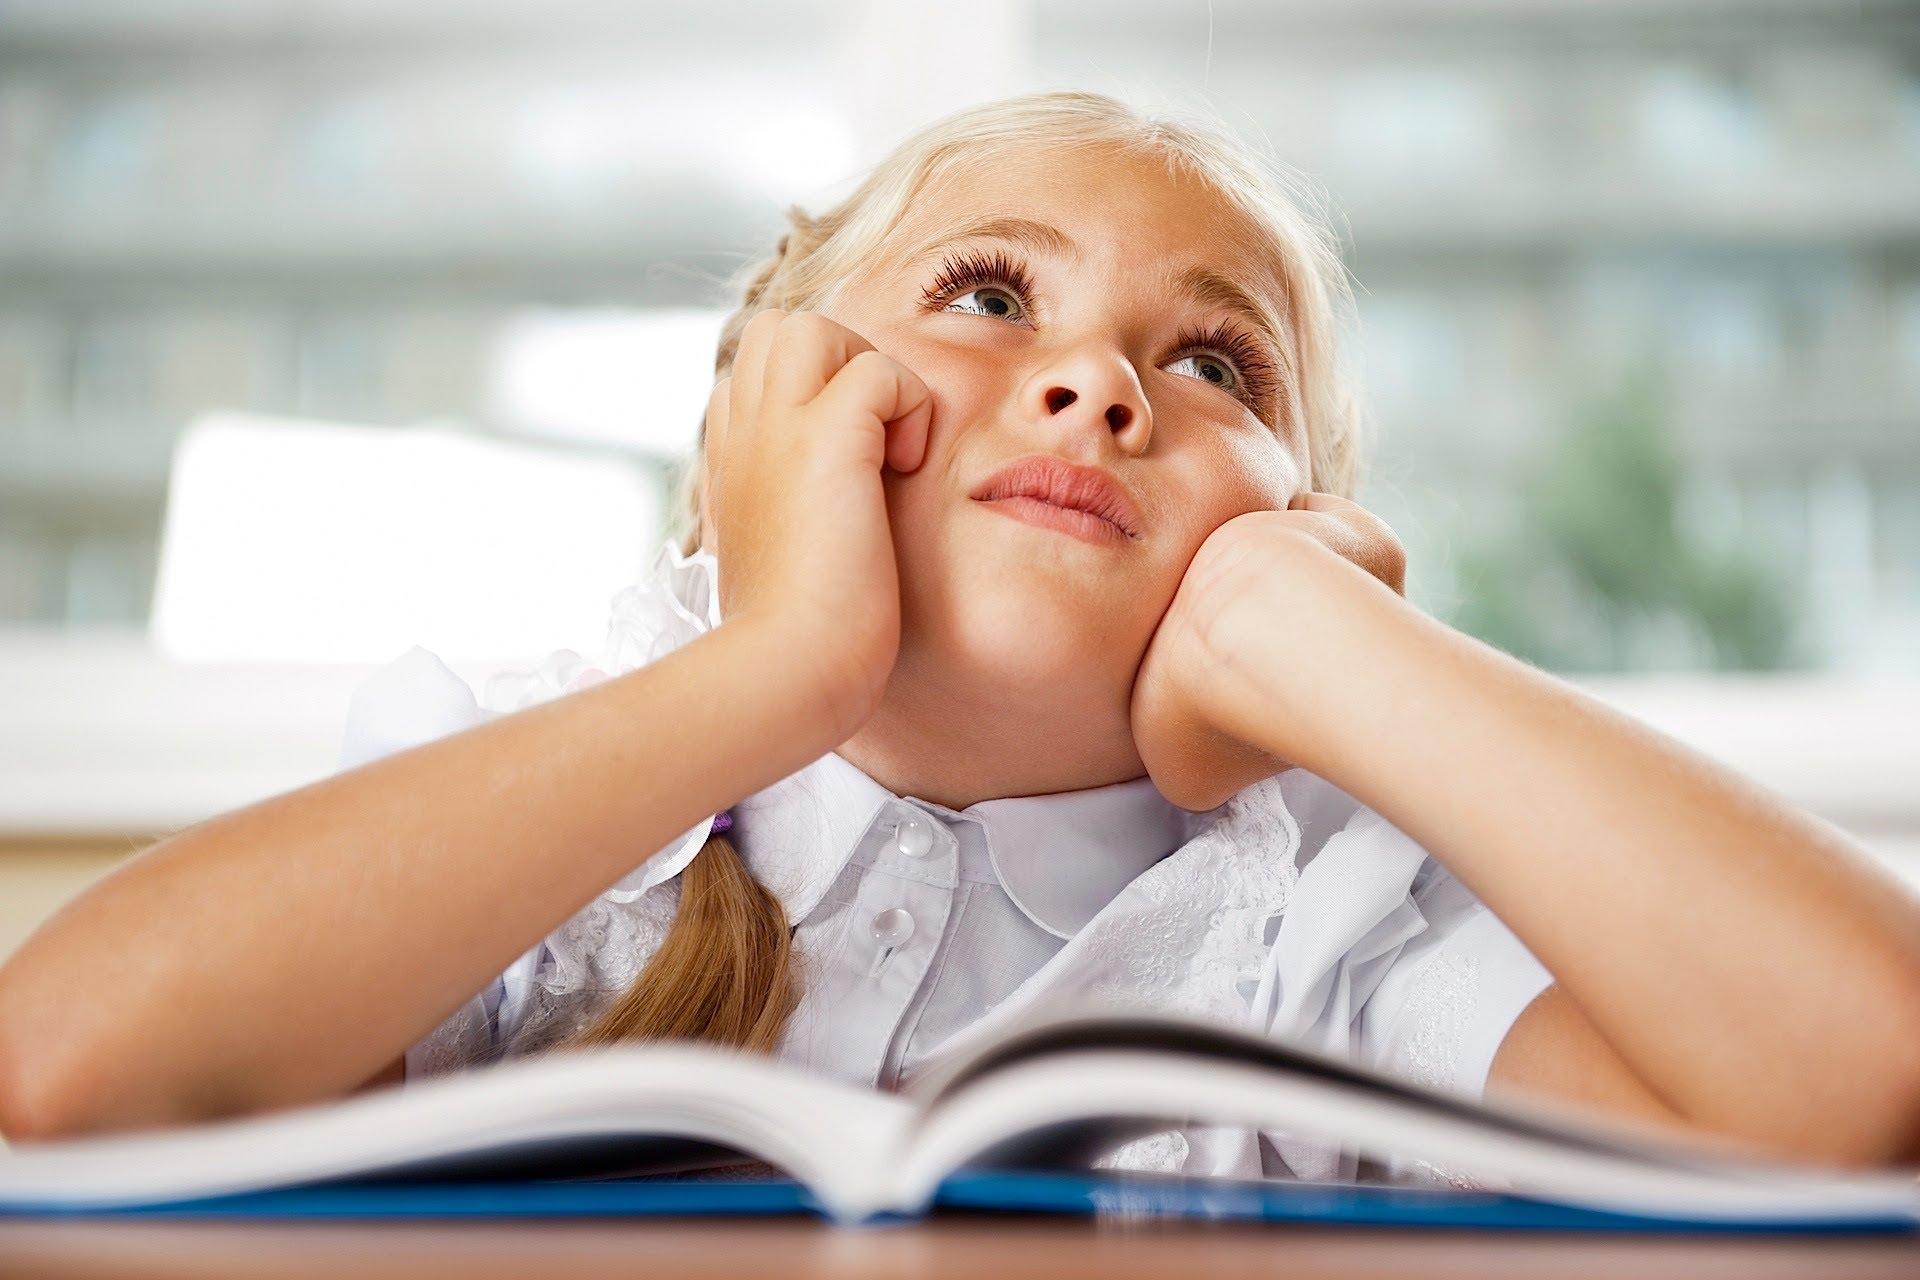 Çocuklarda Dikkat Eksikliği Hiperaktivite Bozukluğu (Dehb) Cocuklarda Dikkat Eksikligi Hiperaktivite Bozuklugu Dehb 6007A70A04B0E